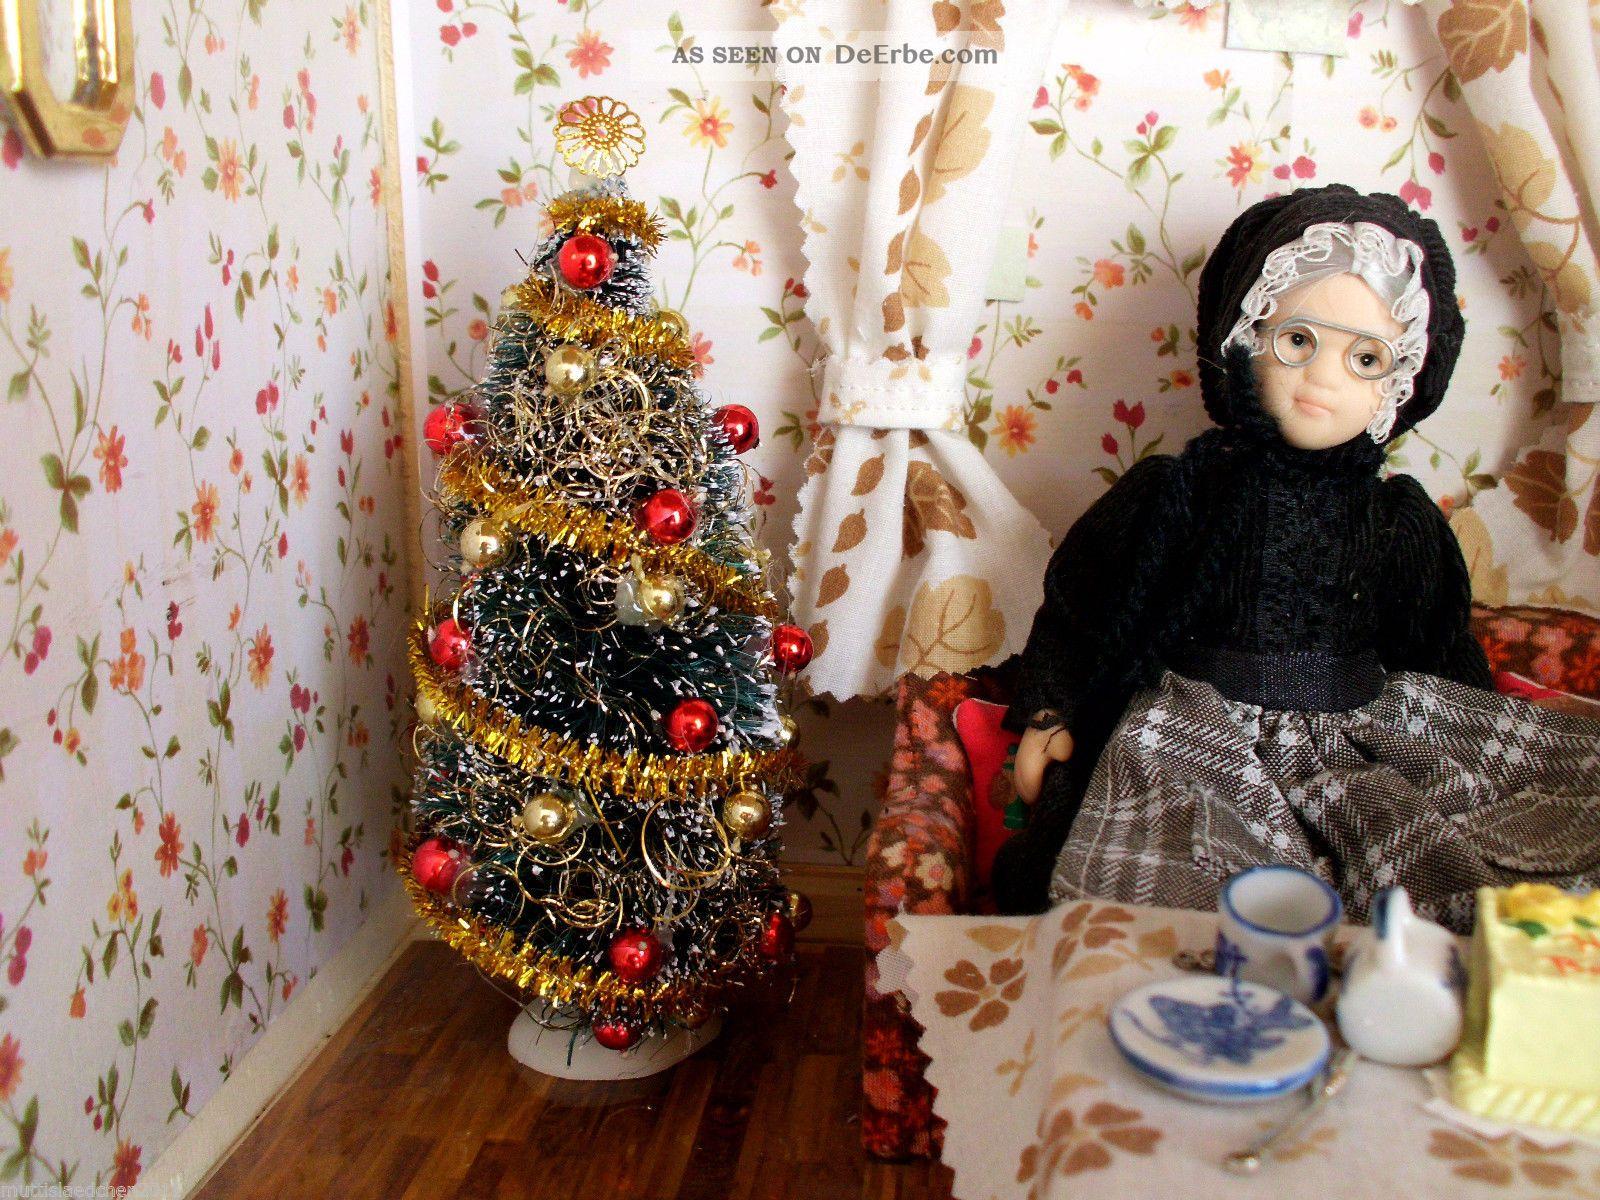 weihnachtsbaum geschm ckt in rot gold kugeln 16 cm hoch. Black Bedroom Furniture Sets. Home Design Ideas